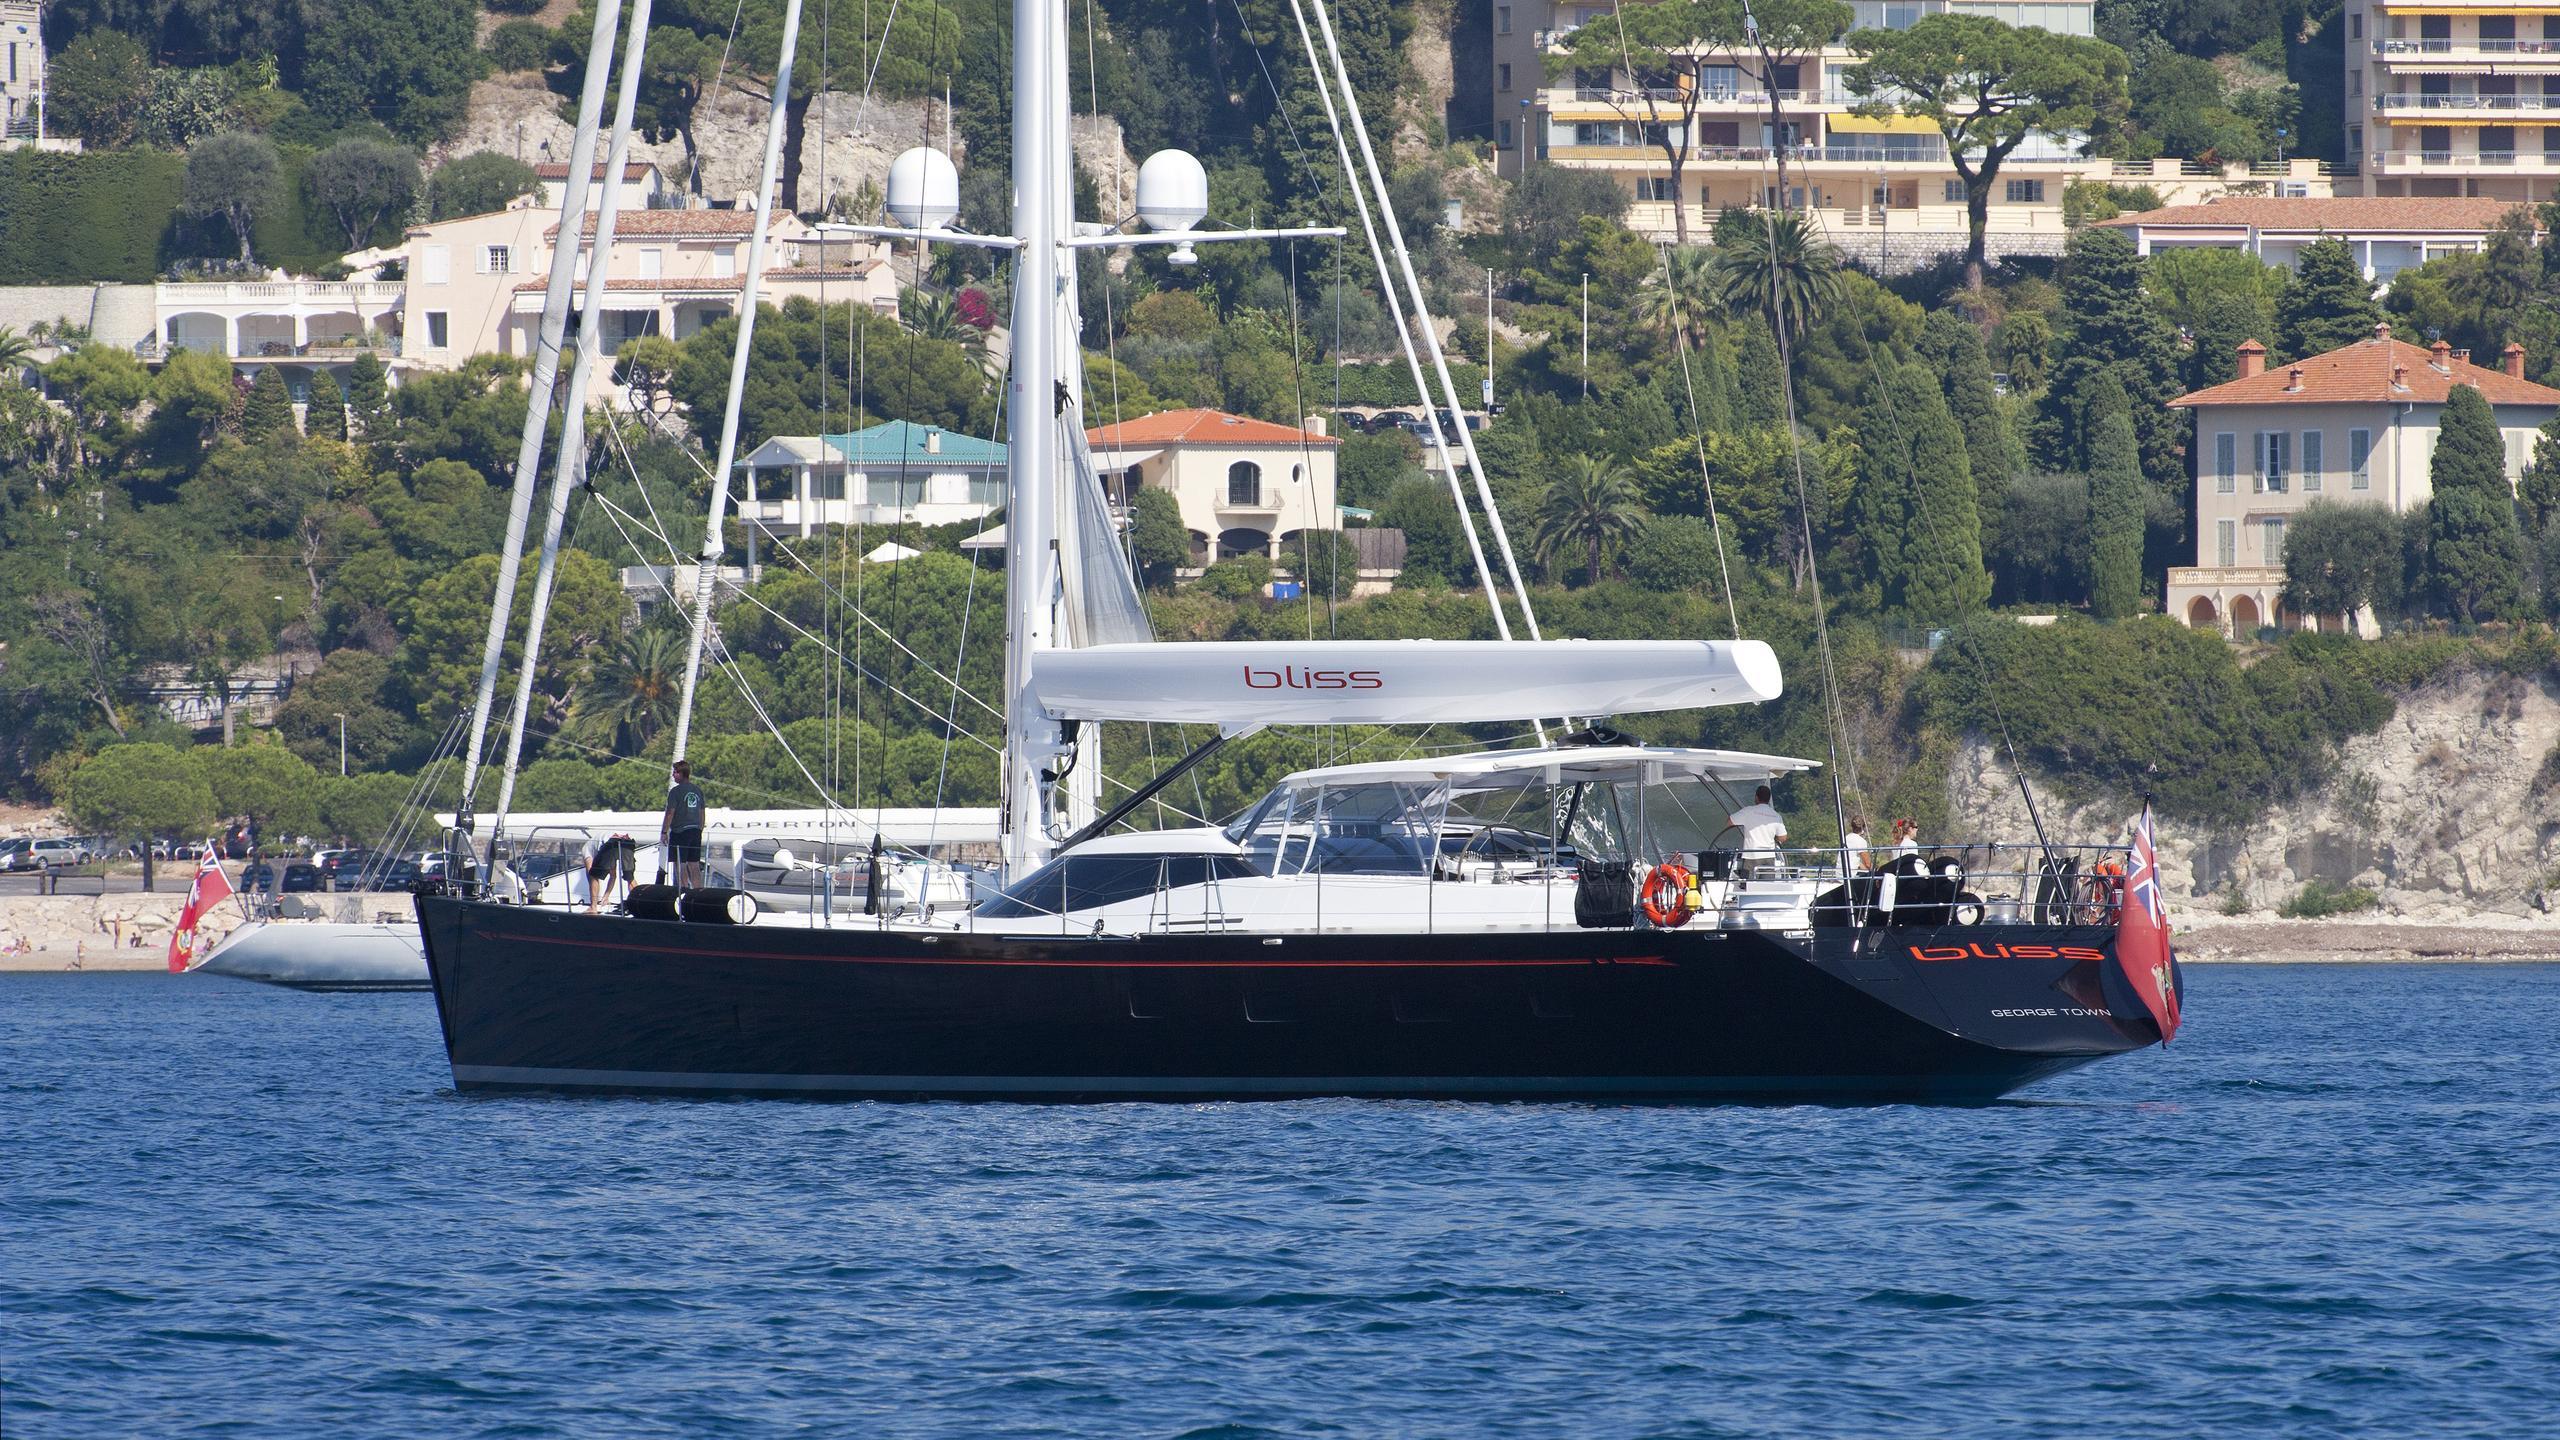 bliss-yacht-exterior